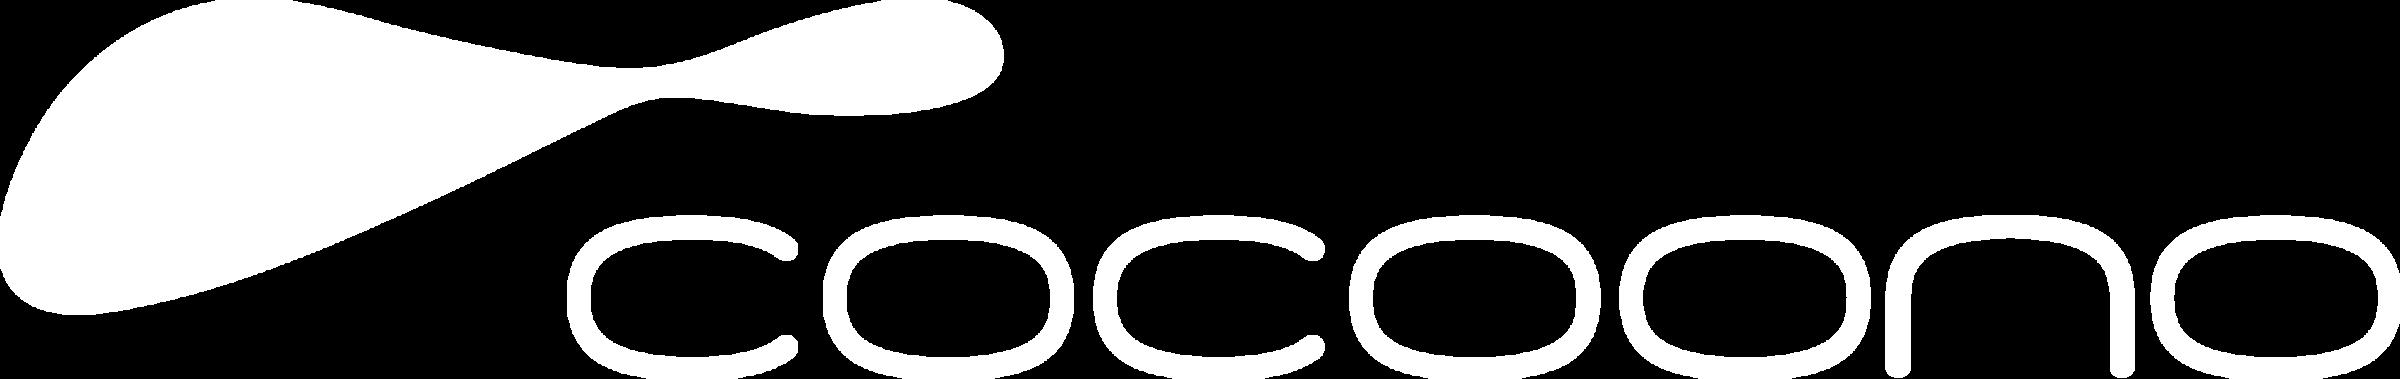 cocoono Logo